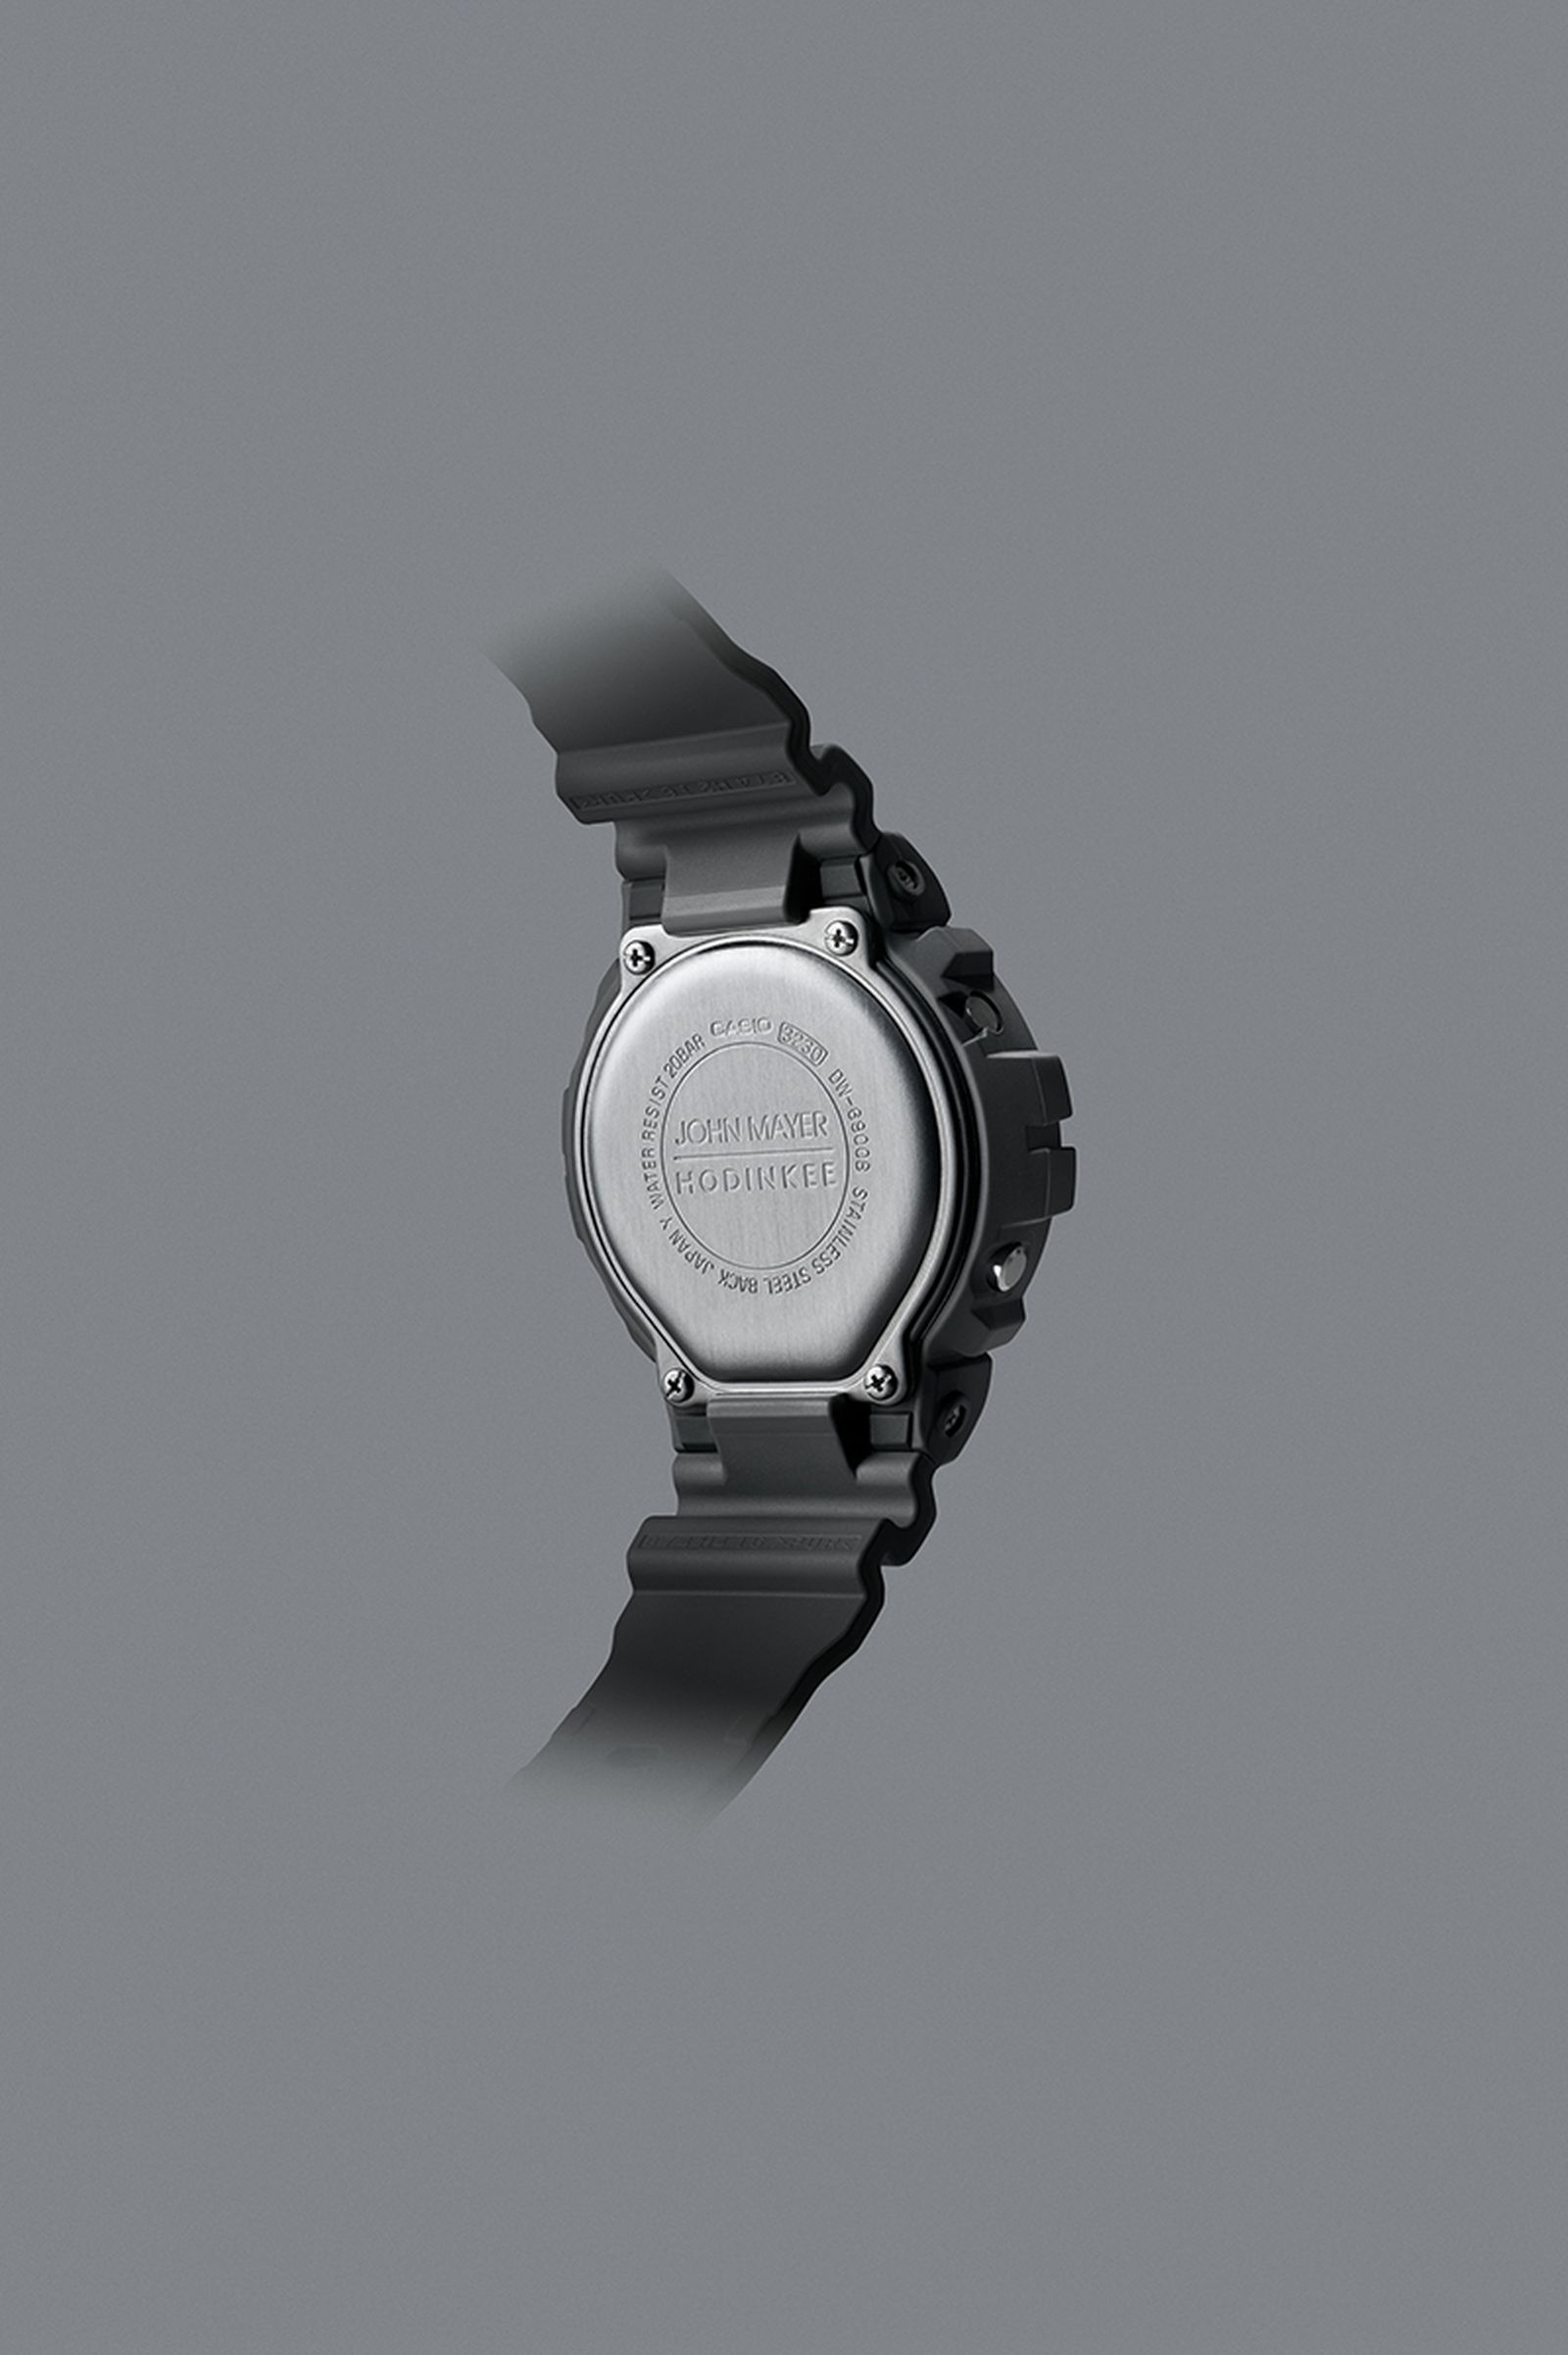 john-mayer-g-shock-ref-6900-04